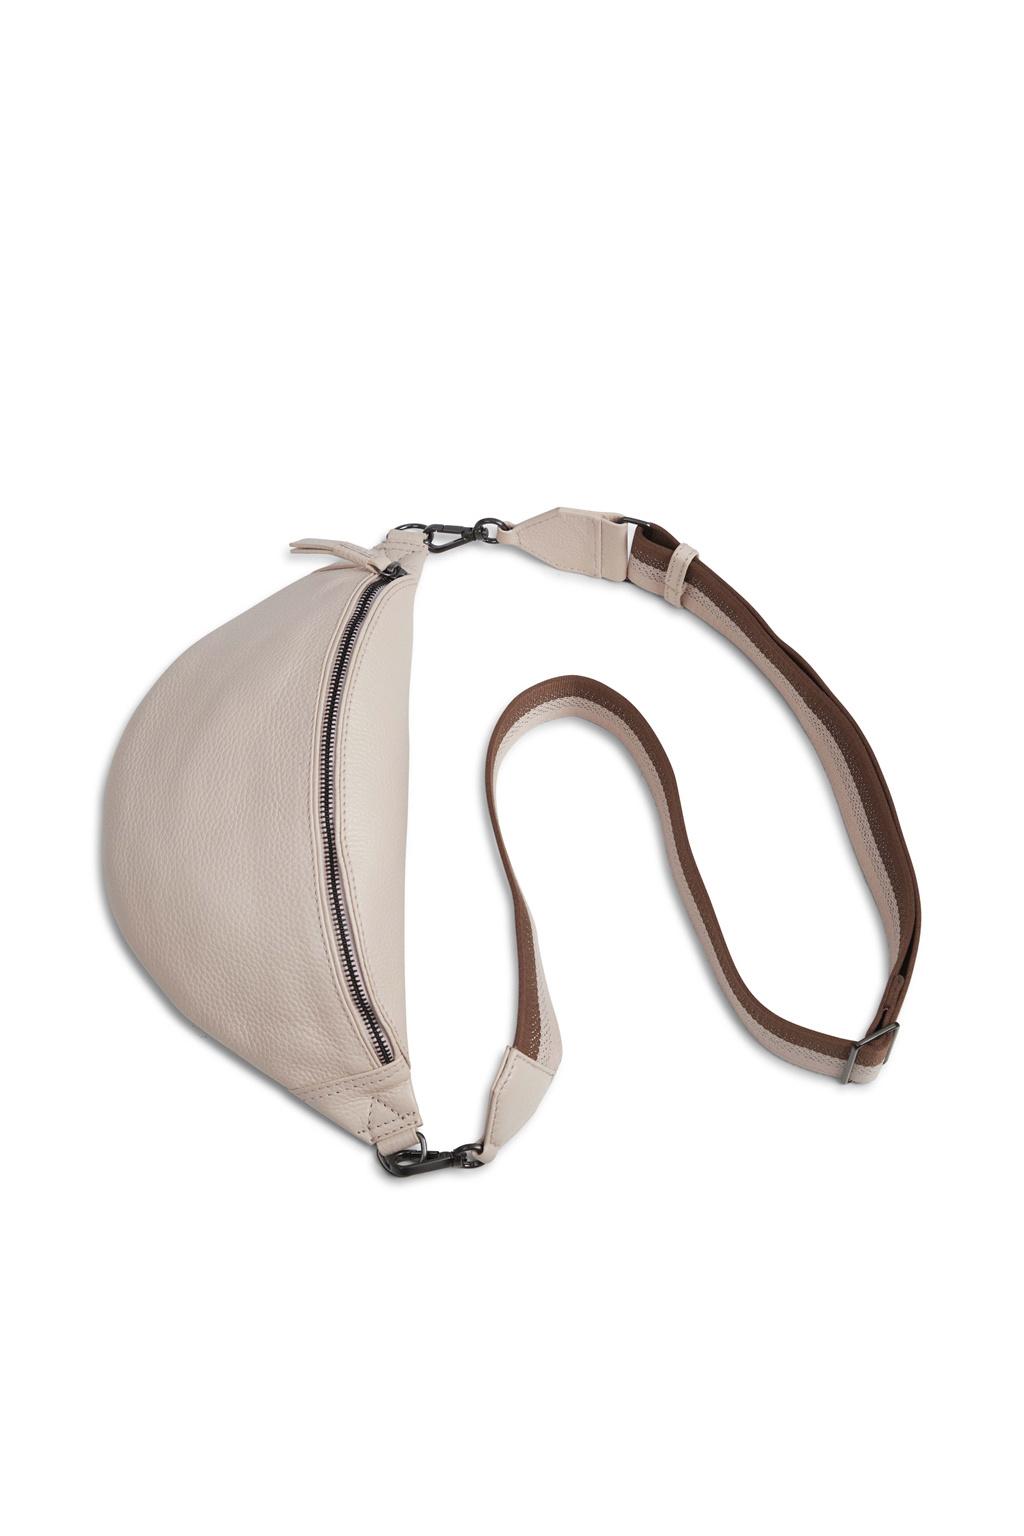 Elinor Bum Bag - Grain Blush w/ Blush + Taupe-3